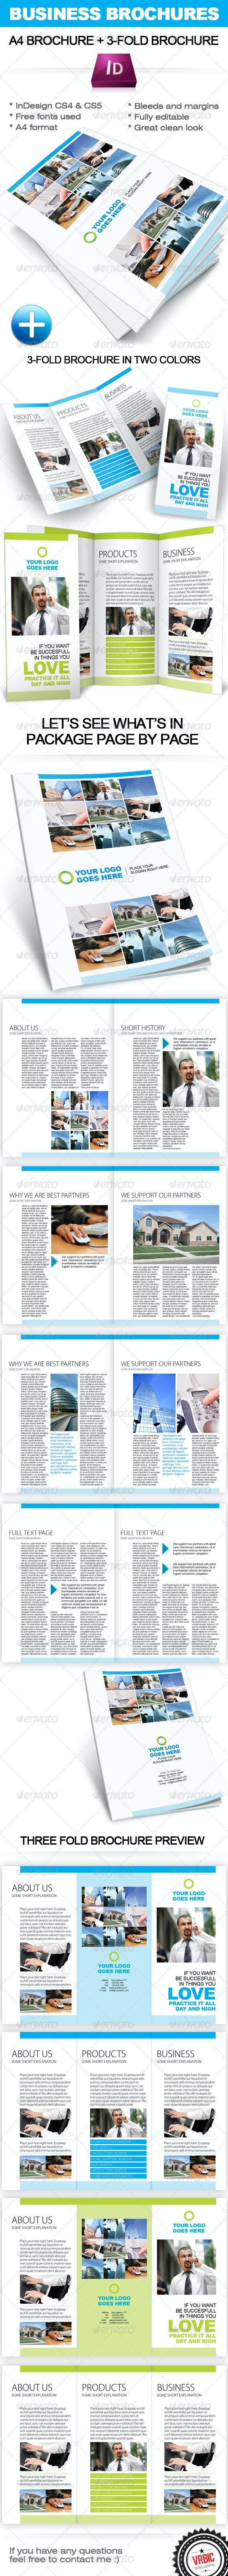 Business Brochure InDesign template (A4+ 3-fold) - Corporate Brochures